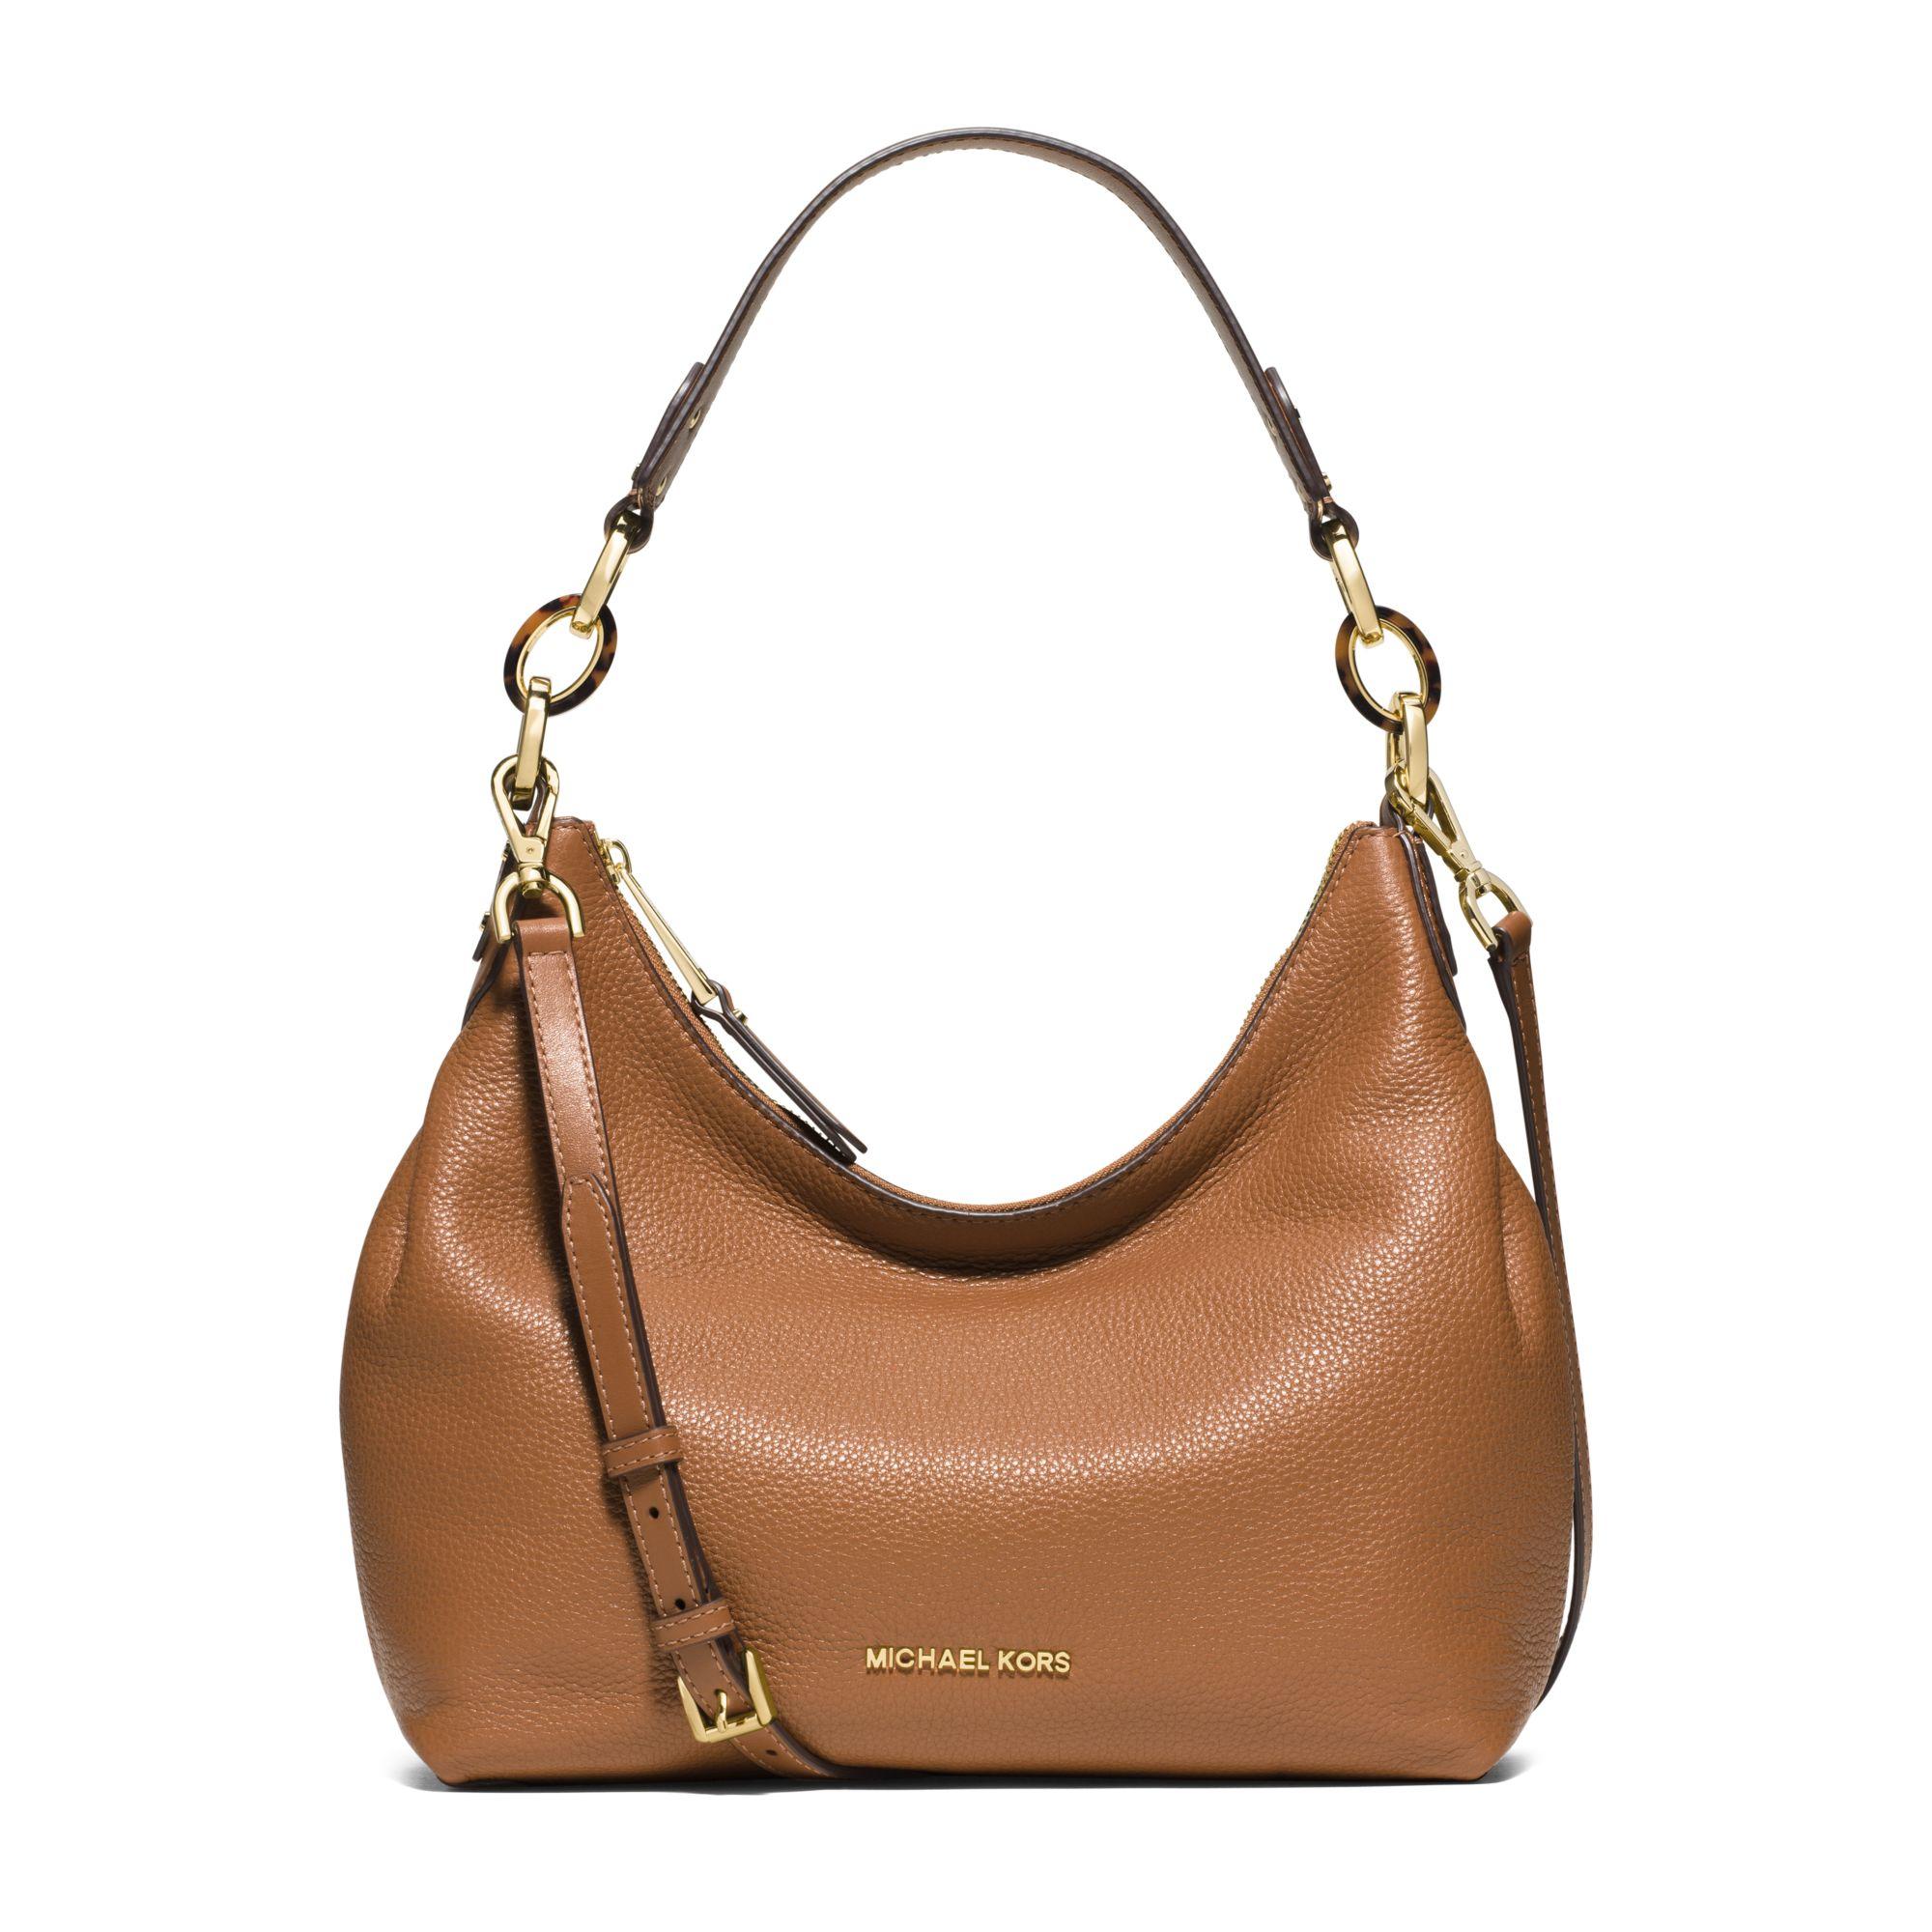 4518f7044006 Lyst - Michael Kors Isabella Medium Leather Shoulder Bag in Brown